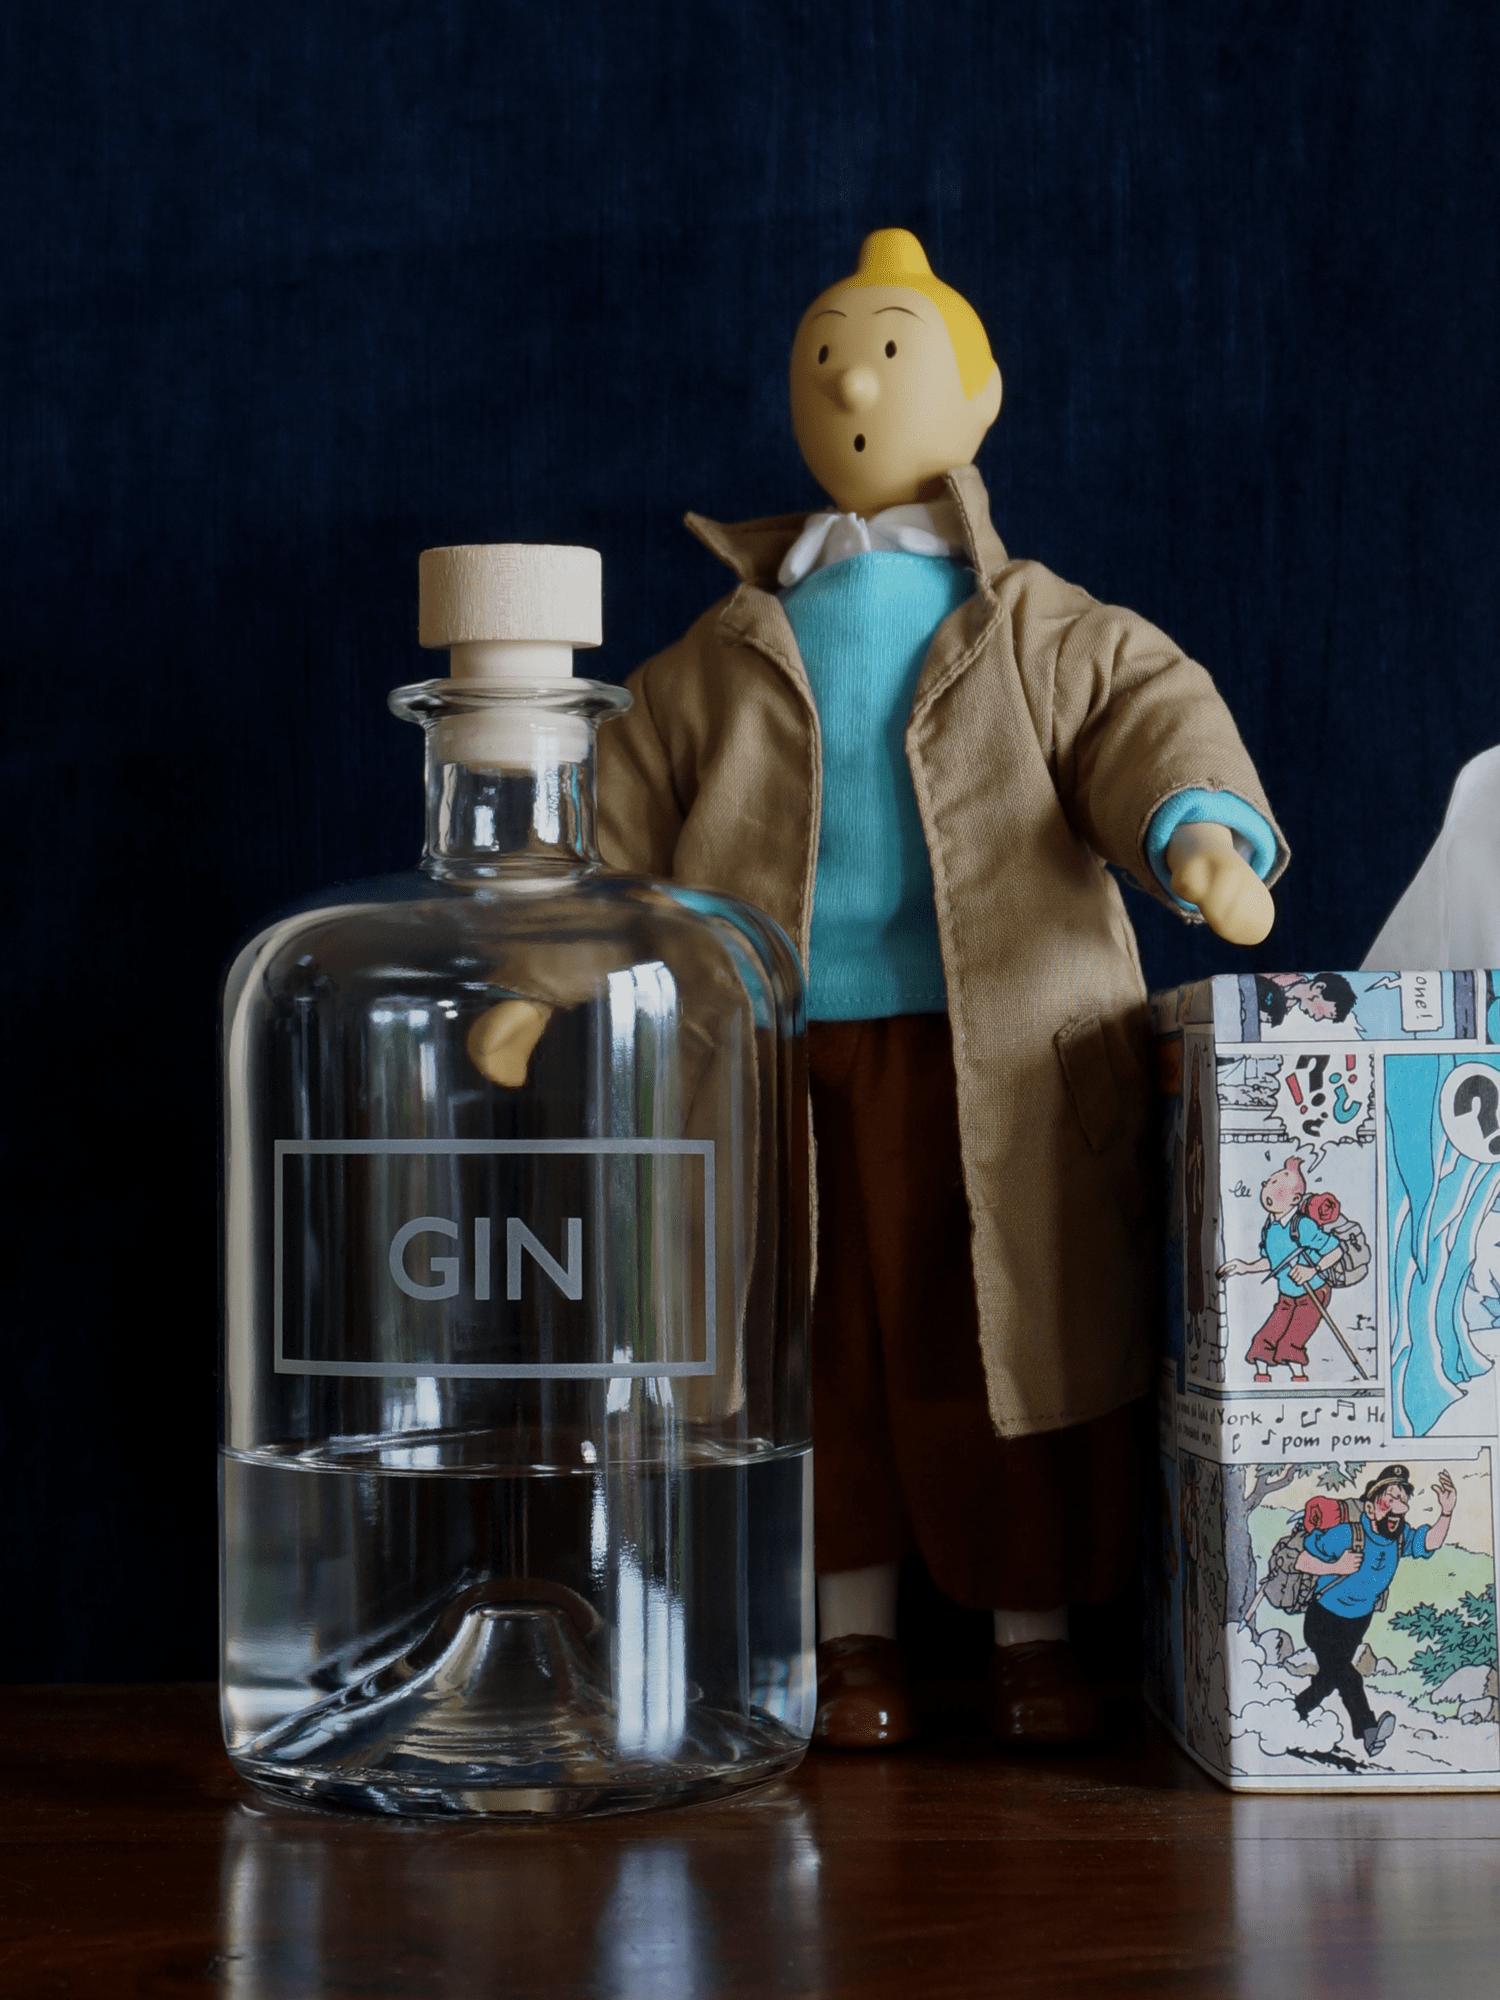 Good looking gin bottle | Blasted, Sheffield